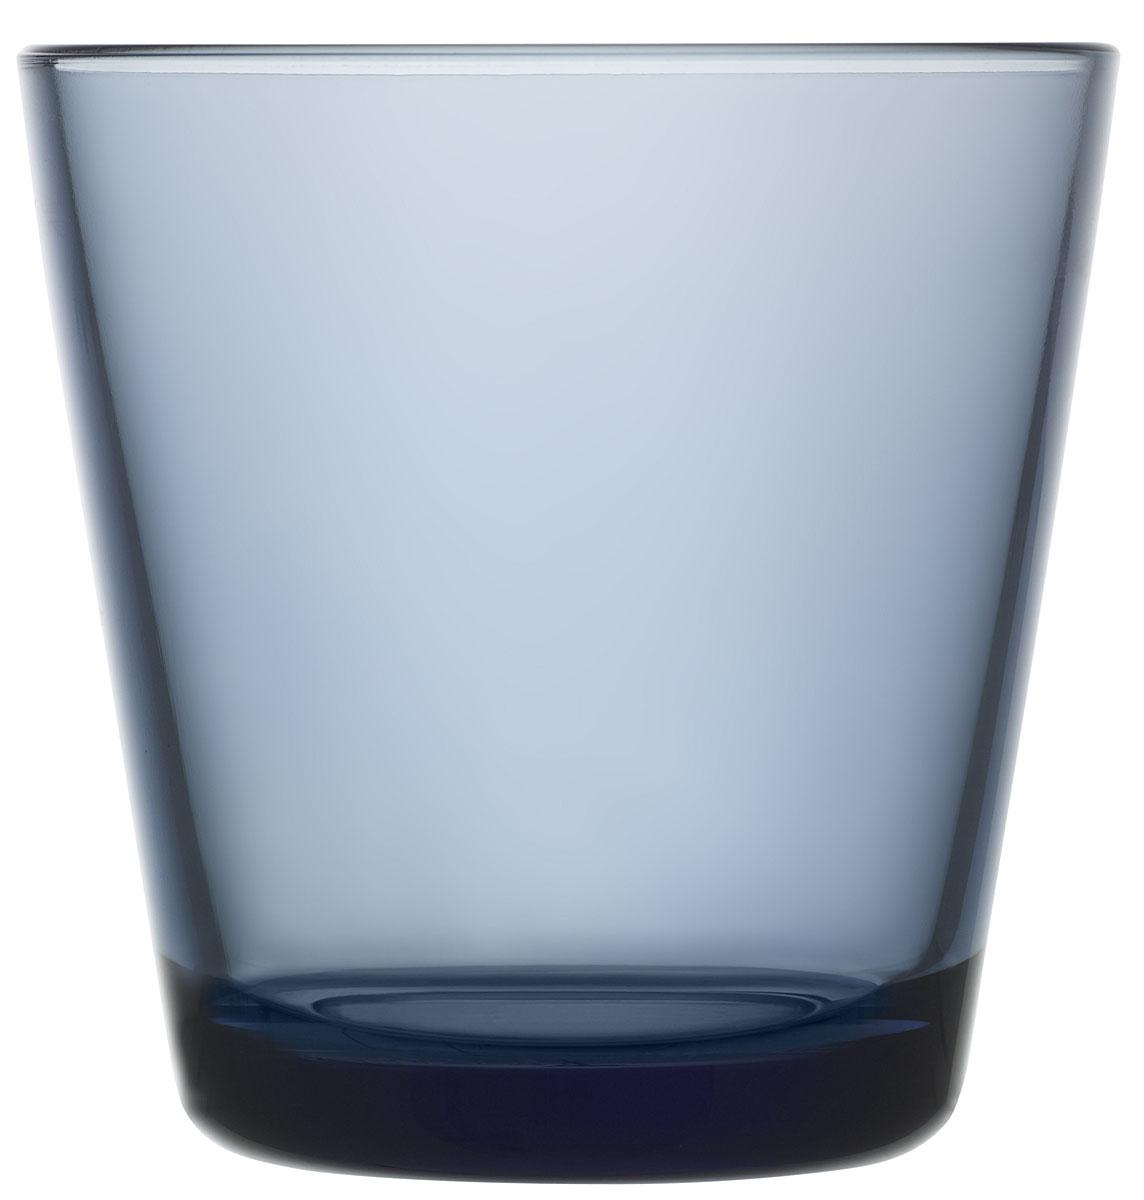 Стакан Iittala Kartio, цвет: темно-синий, 210 мл, 2 шт1008721